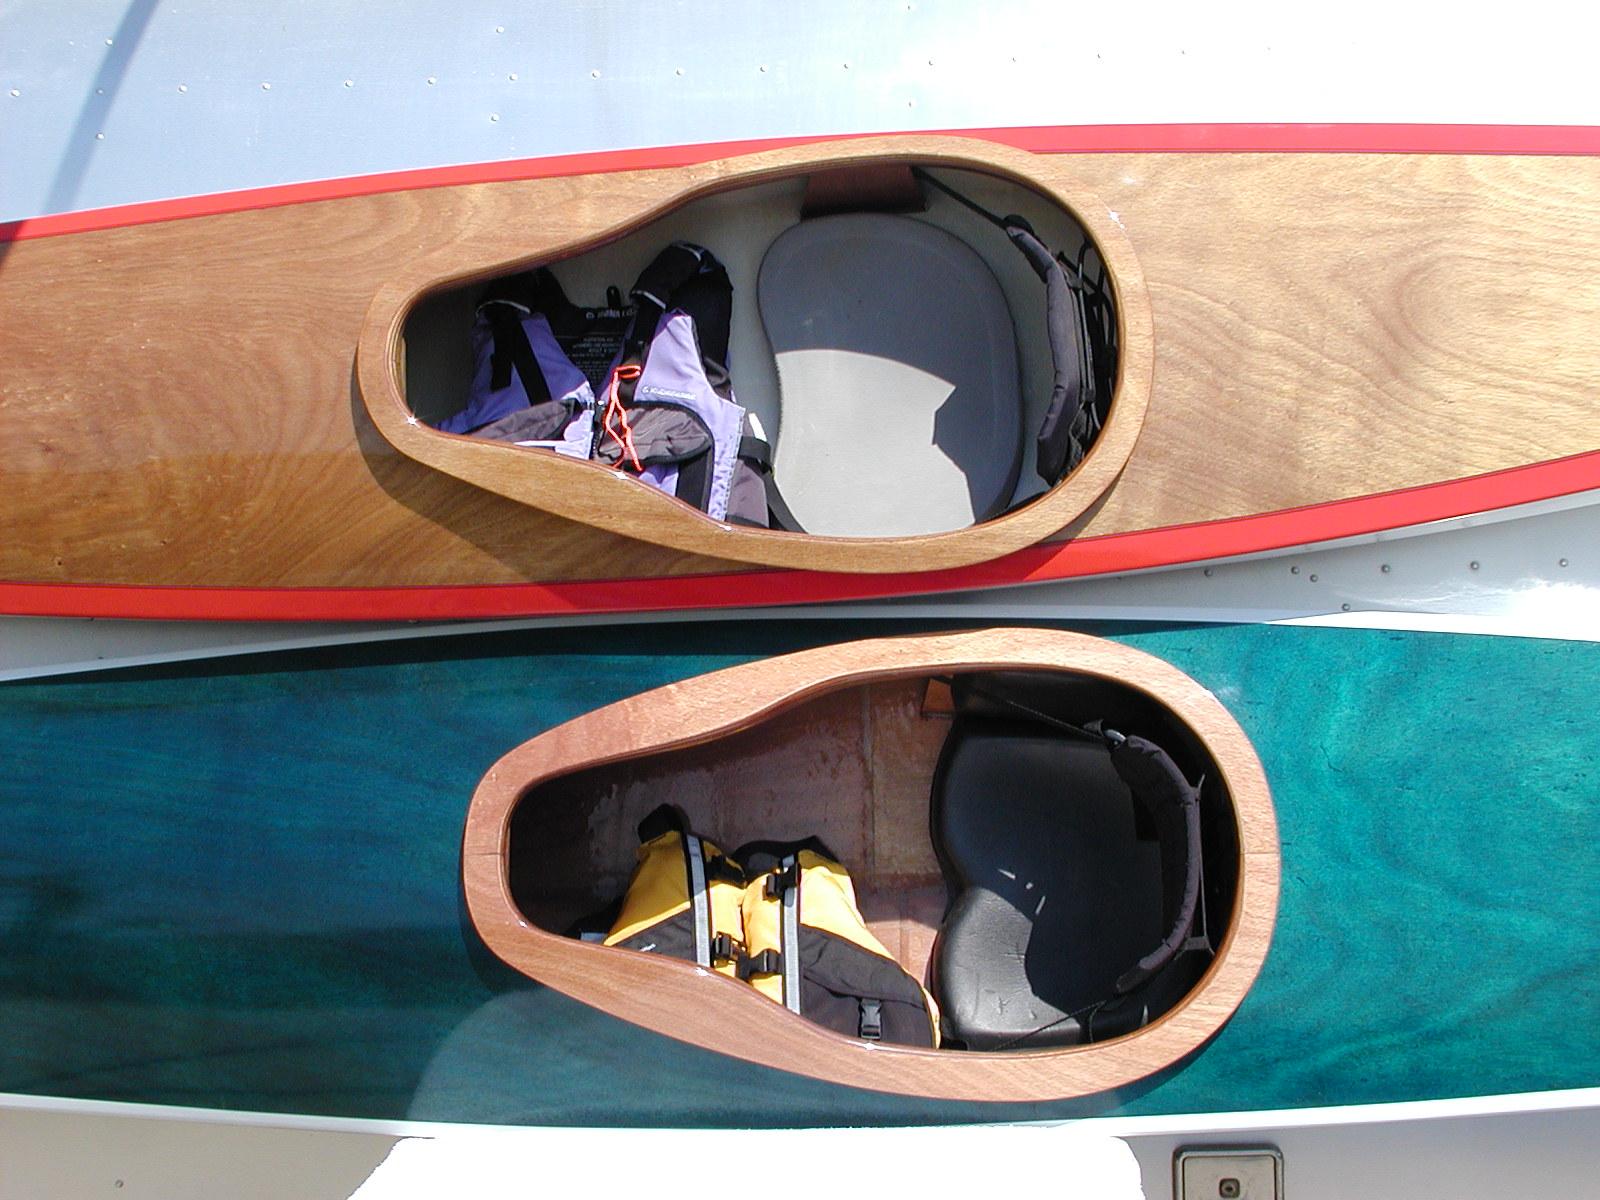 Click image for larger version  Name:Kayak 144.jpg Views:514 Size:413.7 KB ID:58762